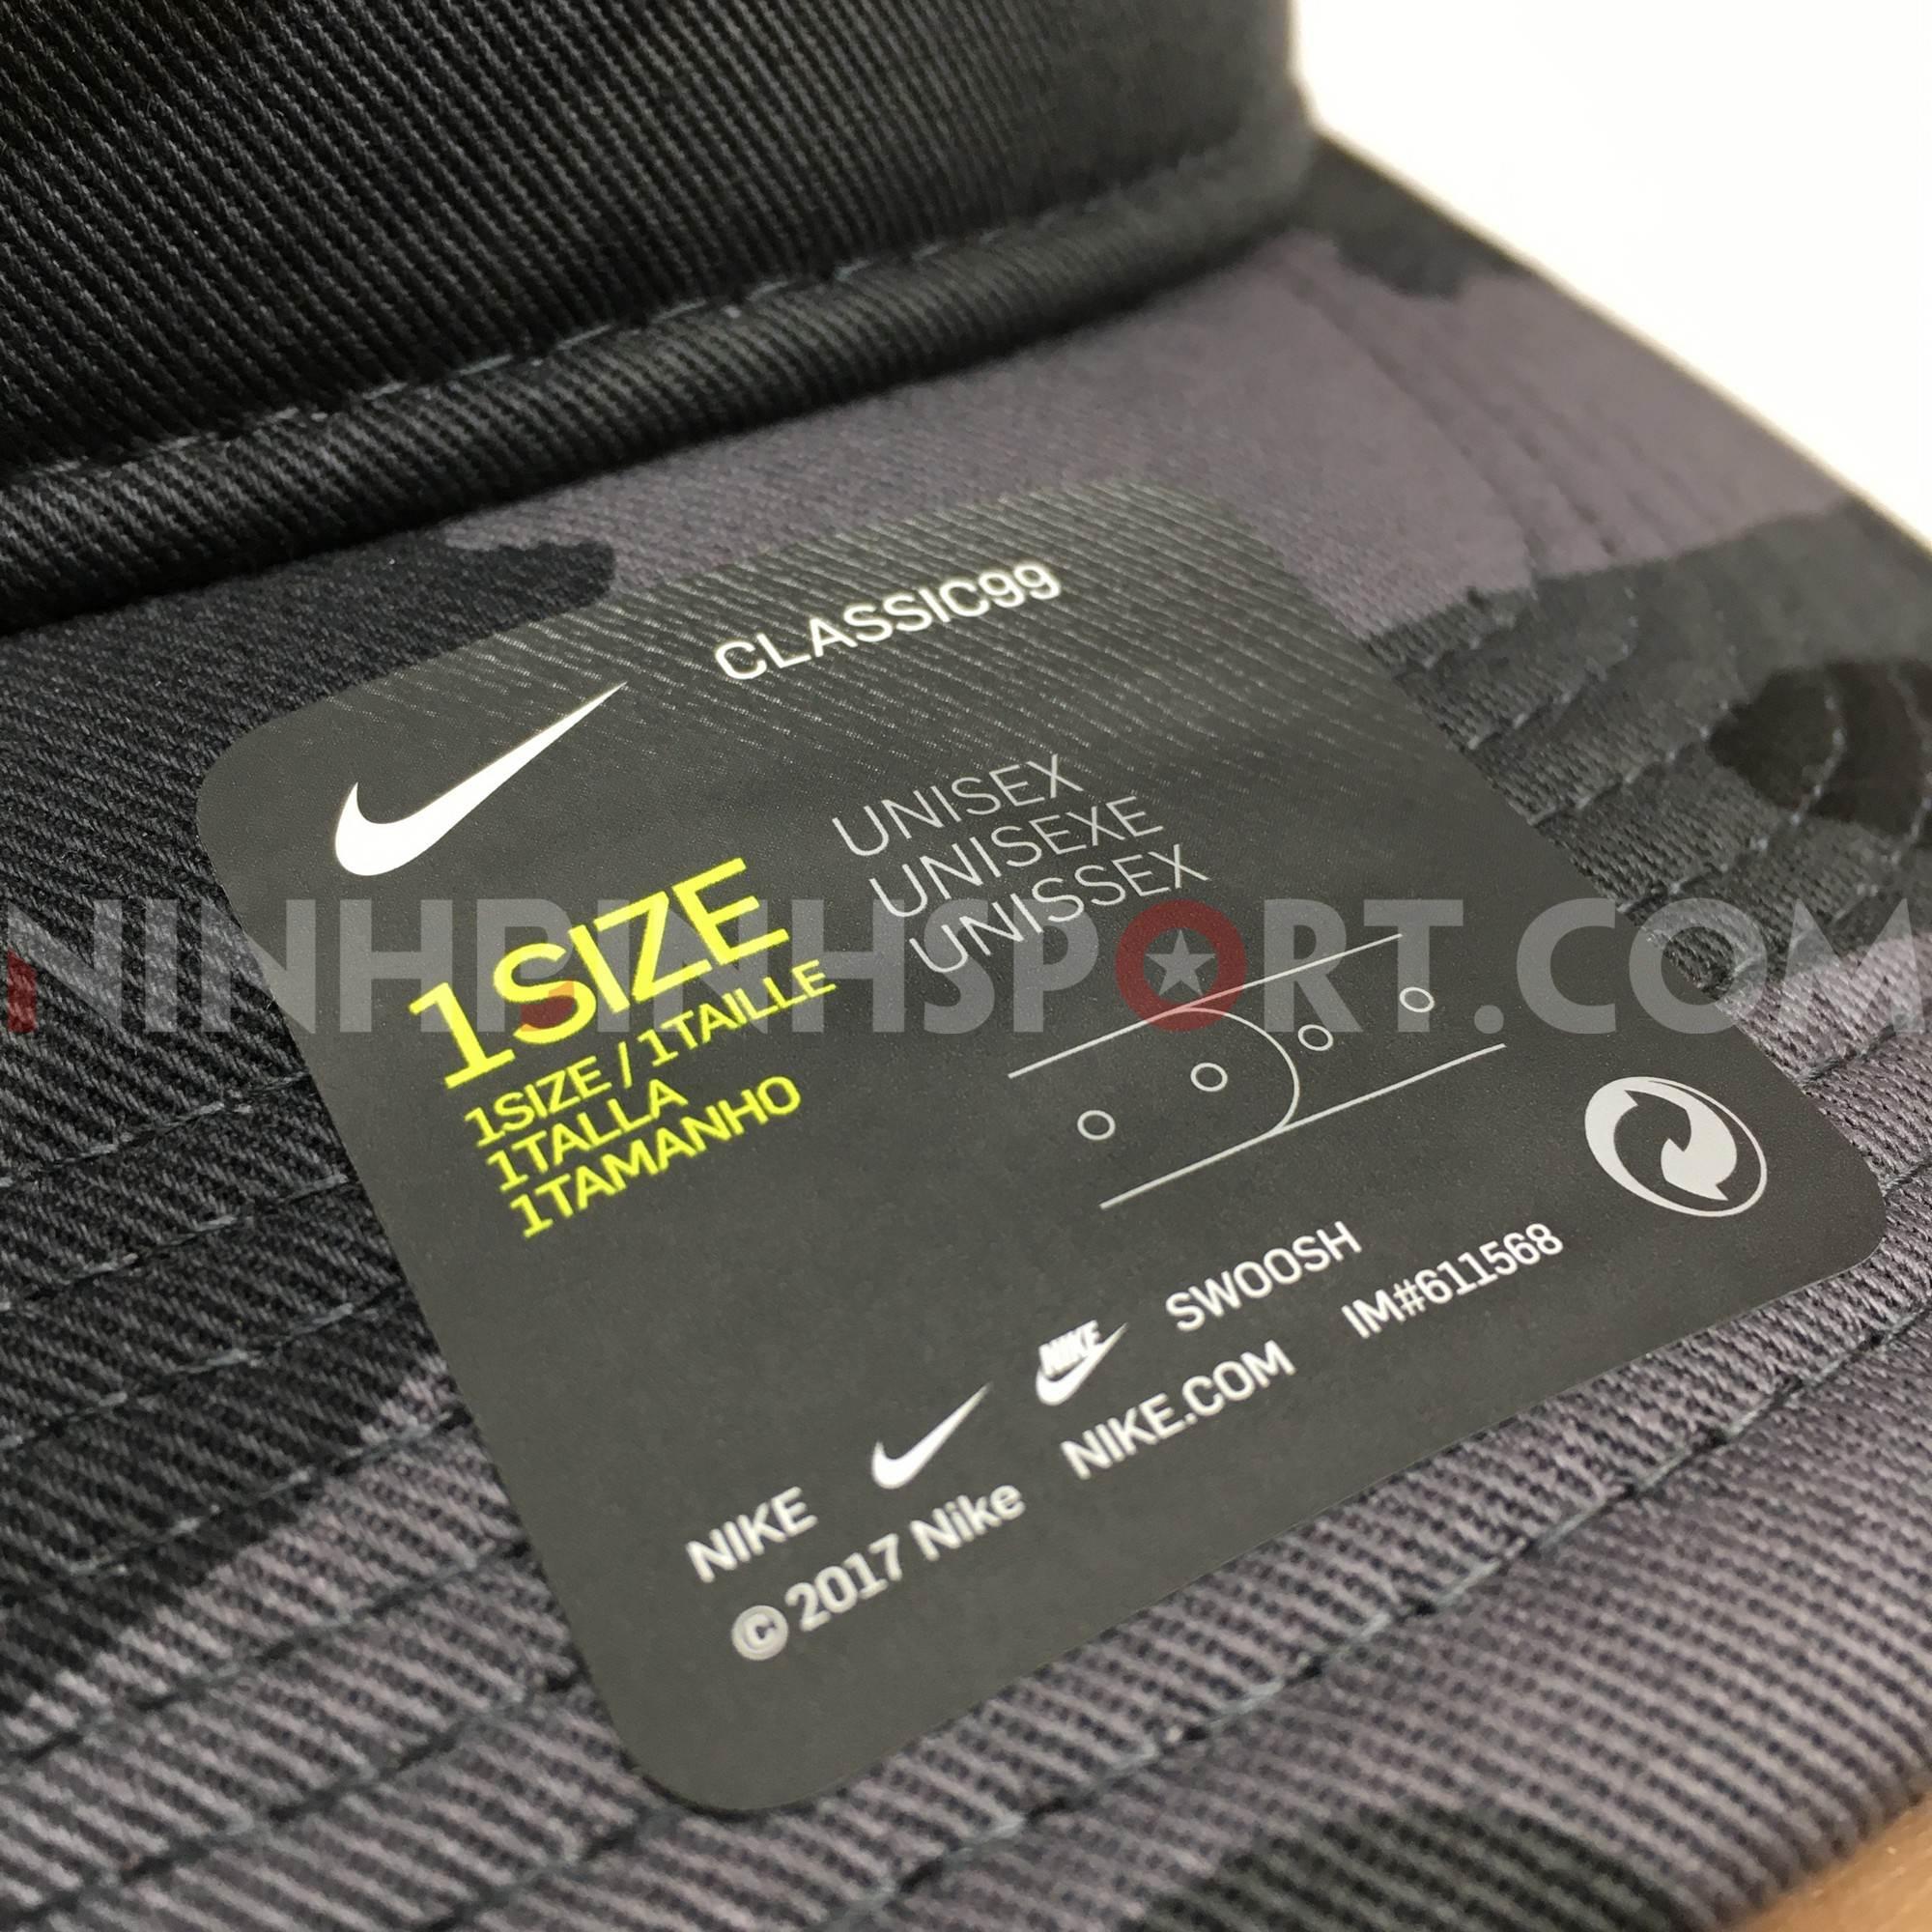 Mũ thể thao Nike NSW Classic 99 Camo CU6342-021